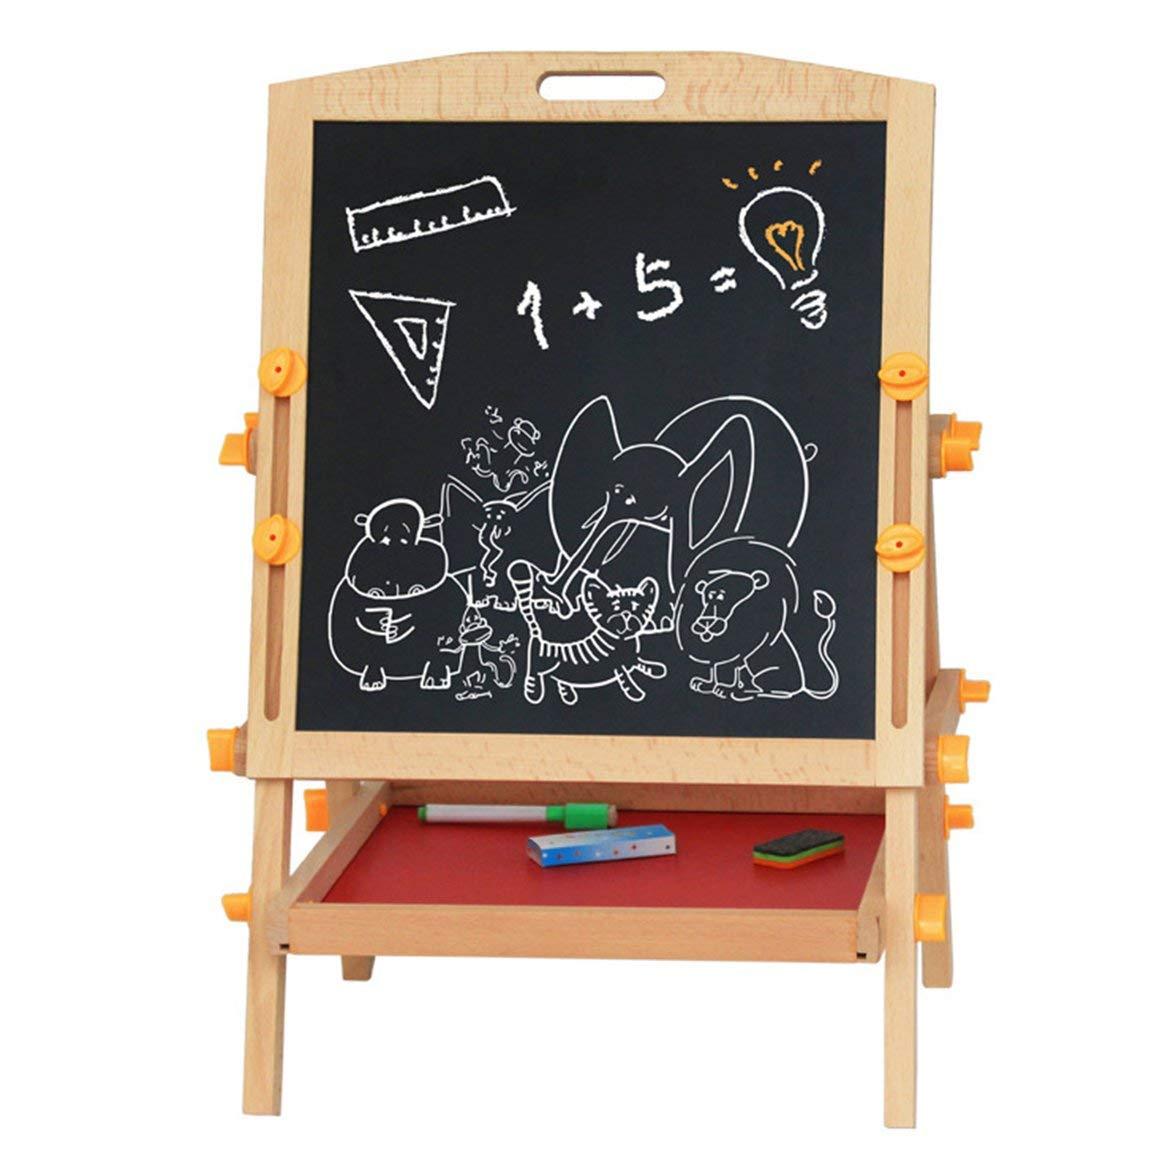 433b60b1e5ff Delicacydex Tablero de Dibujo Dibujo Dibujo magnético de Doble Cara para  niños Conjunto de Caballete cddc6f